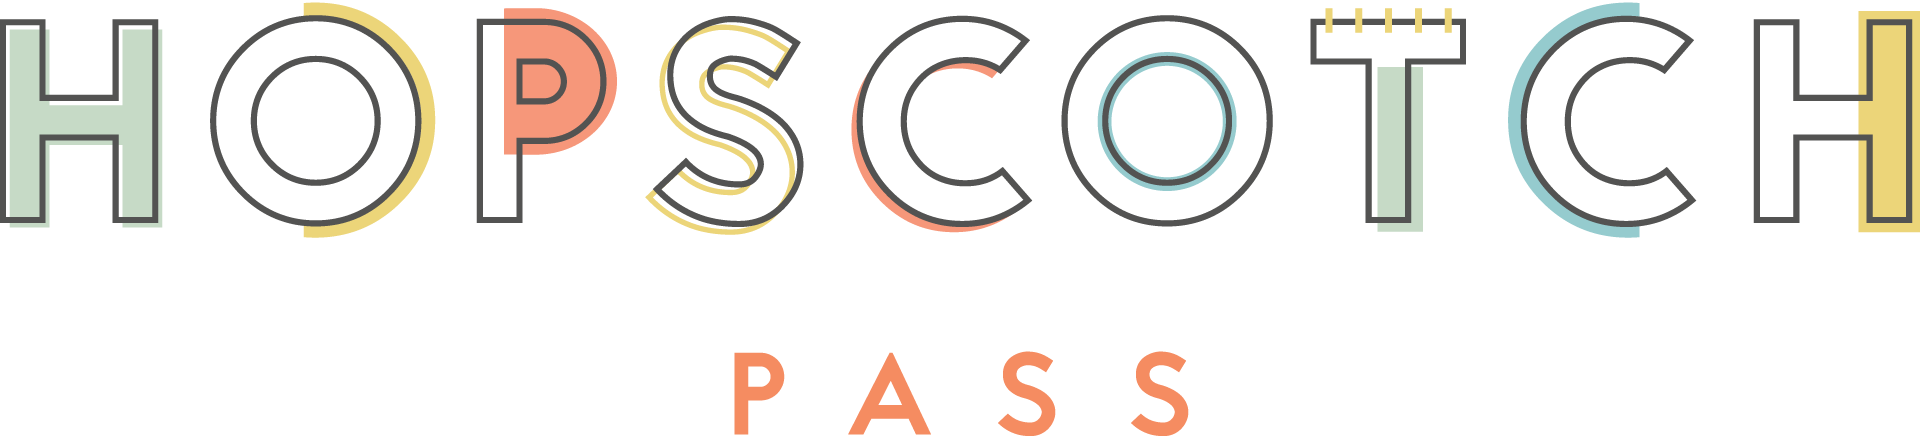 Hopscotch Pass Logo designed by Amari Creative.png